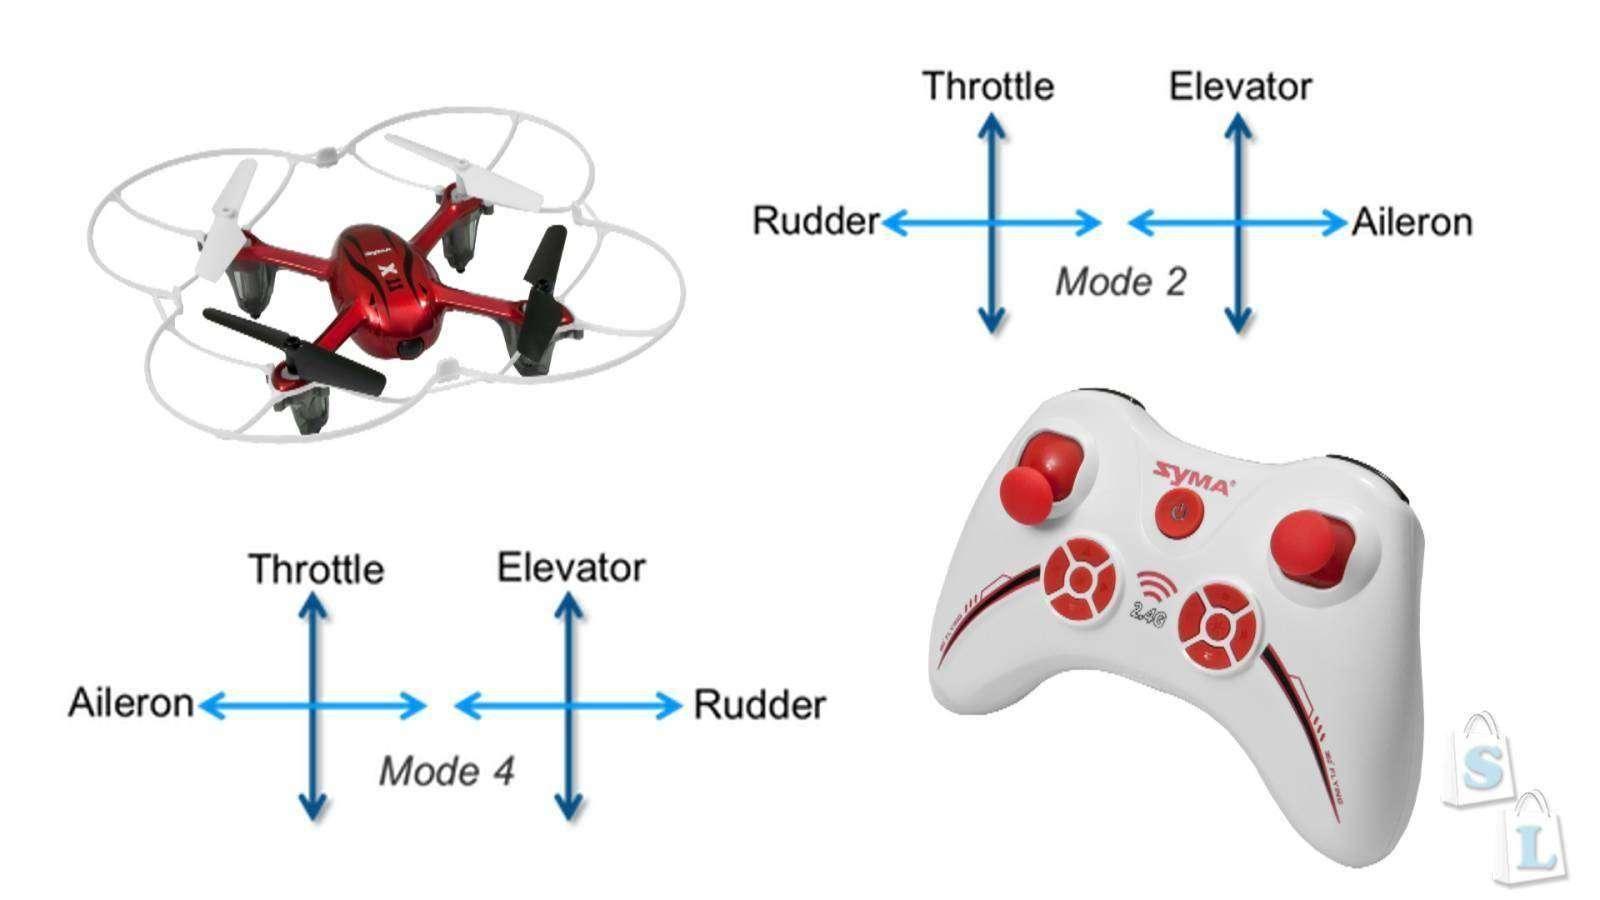 Lightake: Syma X11 2.4GHz, 4Ch, 6 Axis Gyro, RC Quadcopter (RTF)